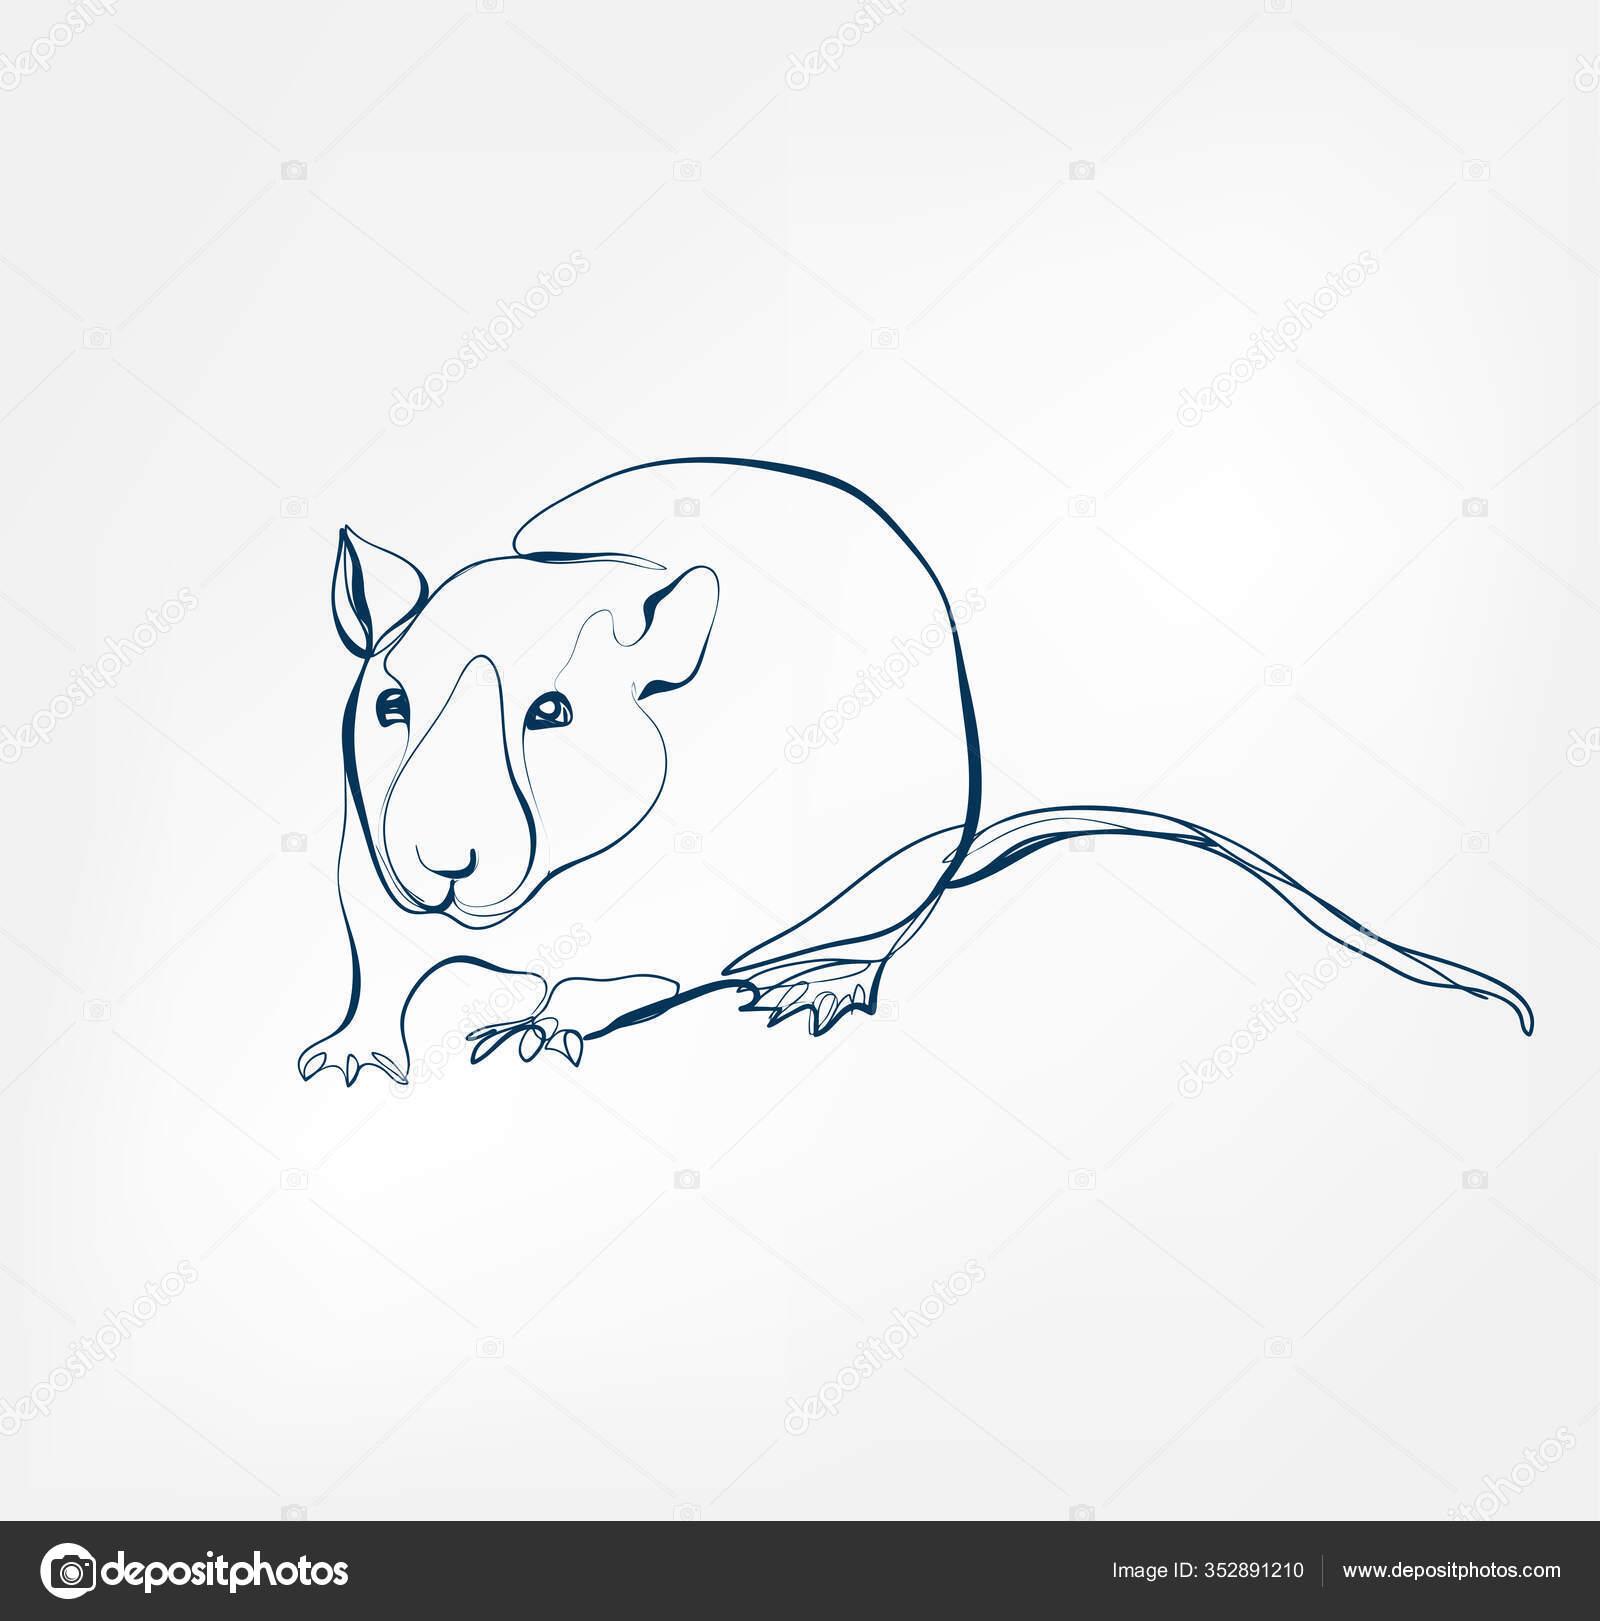 rat vector animal wild one line stock vector c ivona17 mail ru 352891210 depositphotos